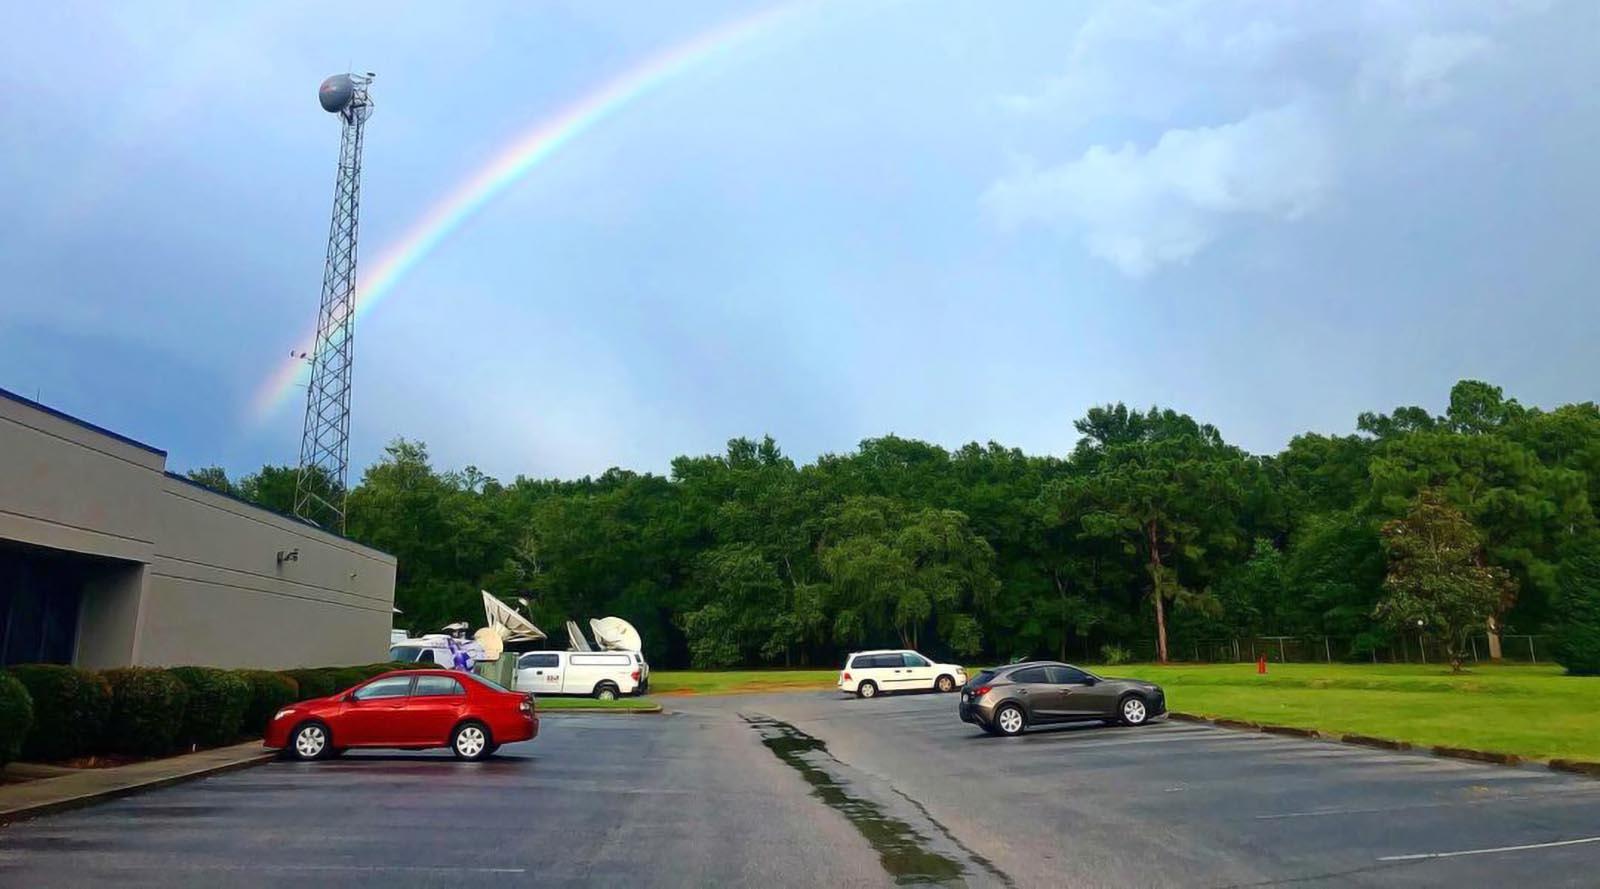 Studio Location of WEAR TV: 4990 Mobile Highway Pensacola